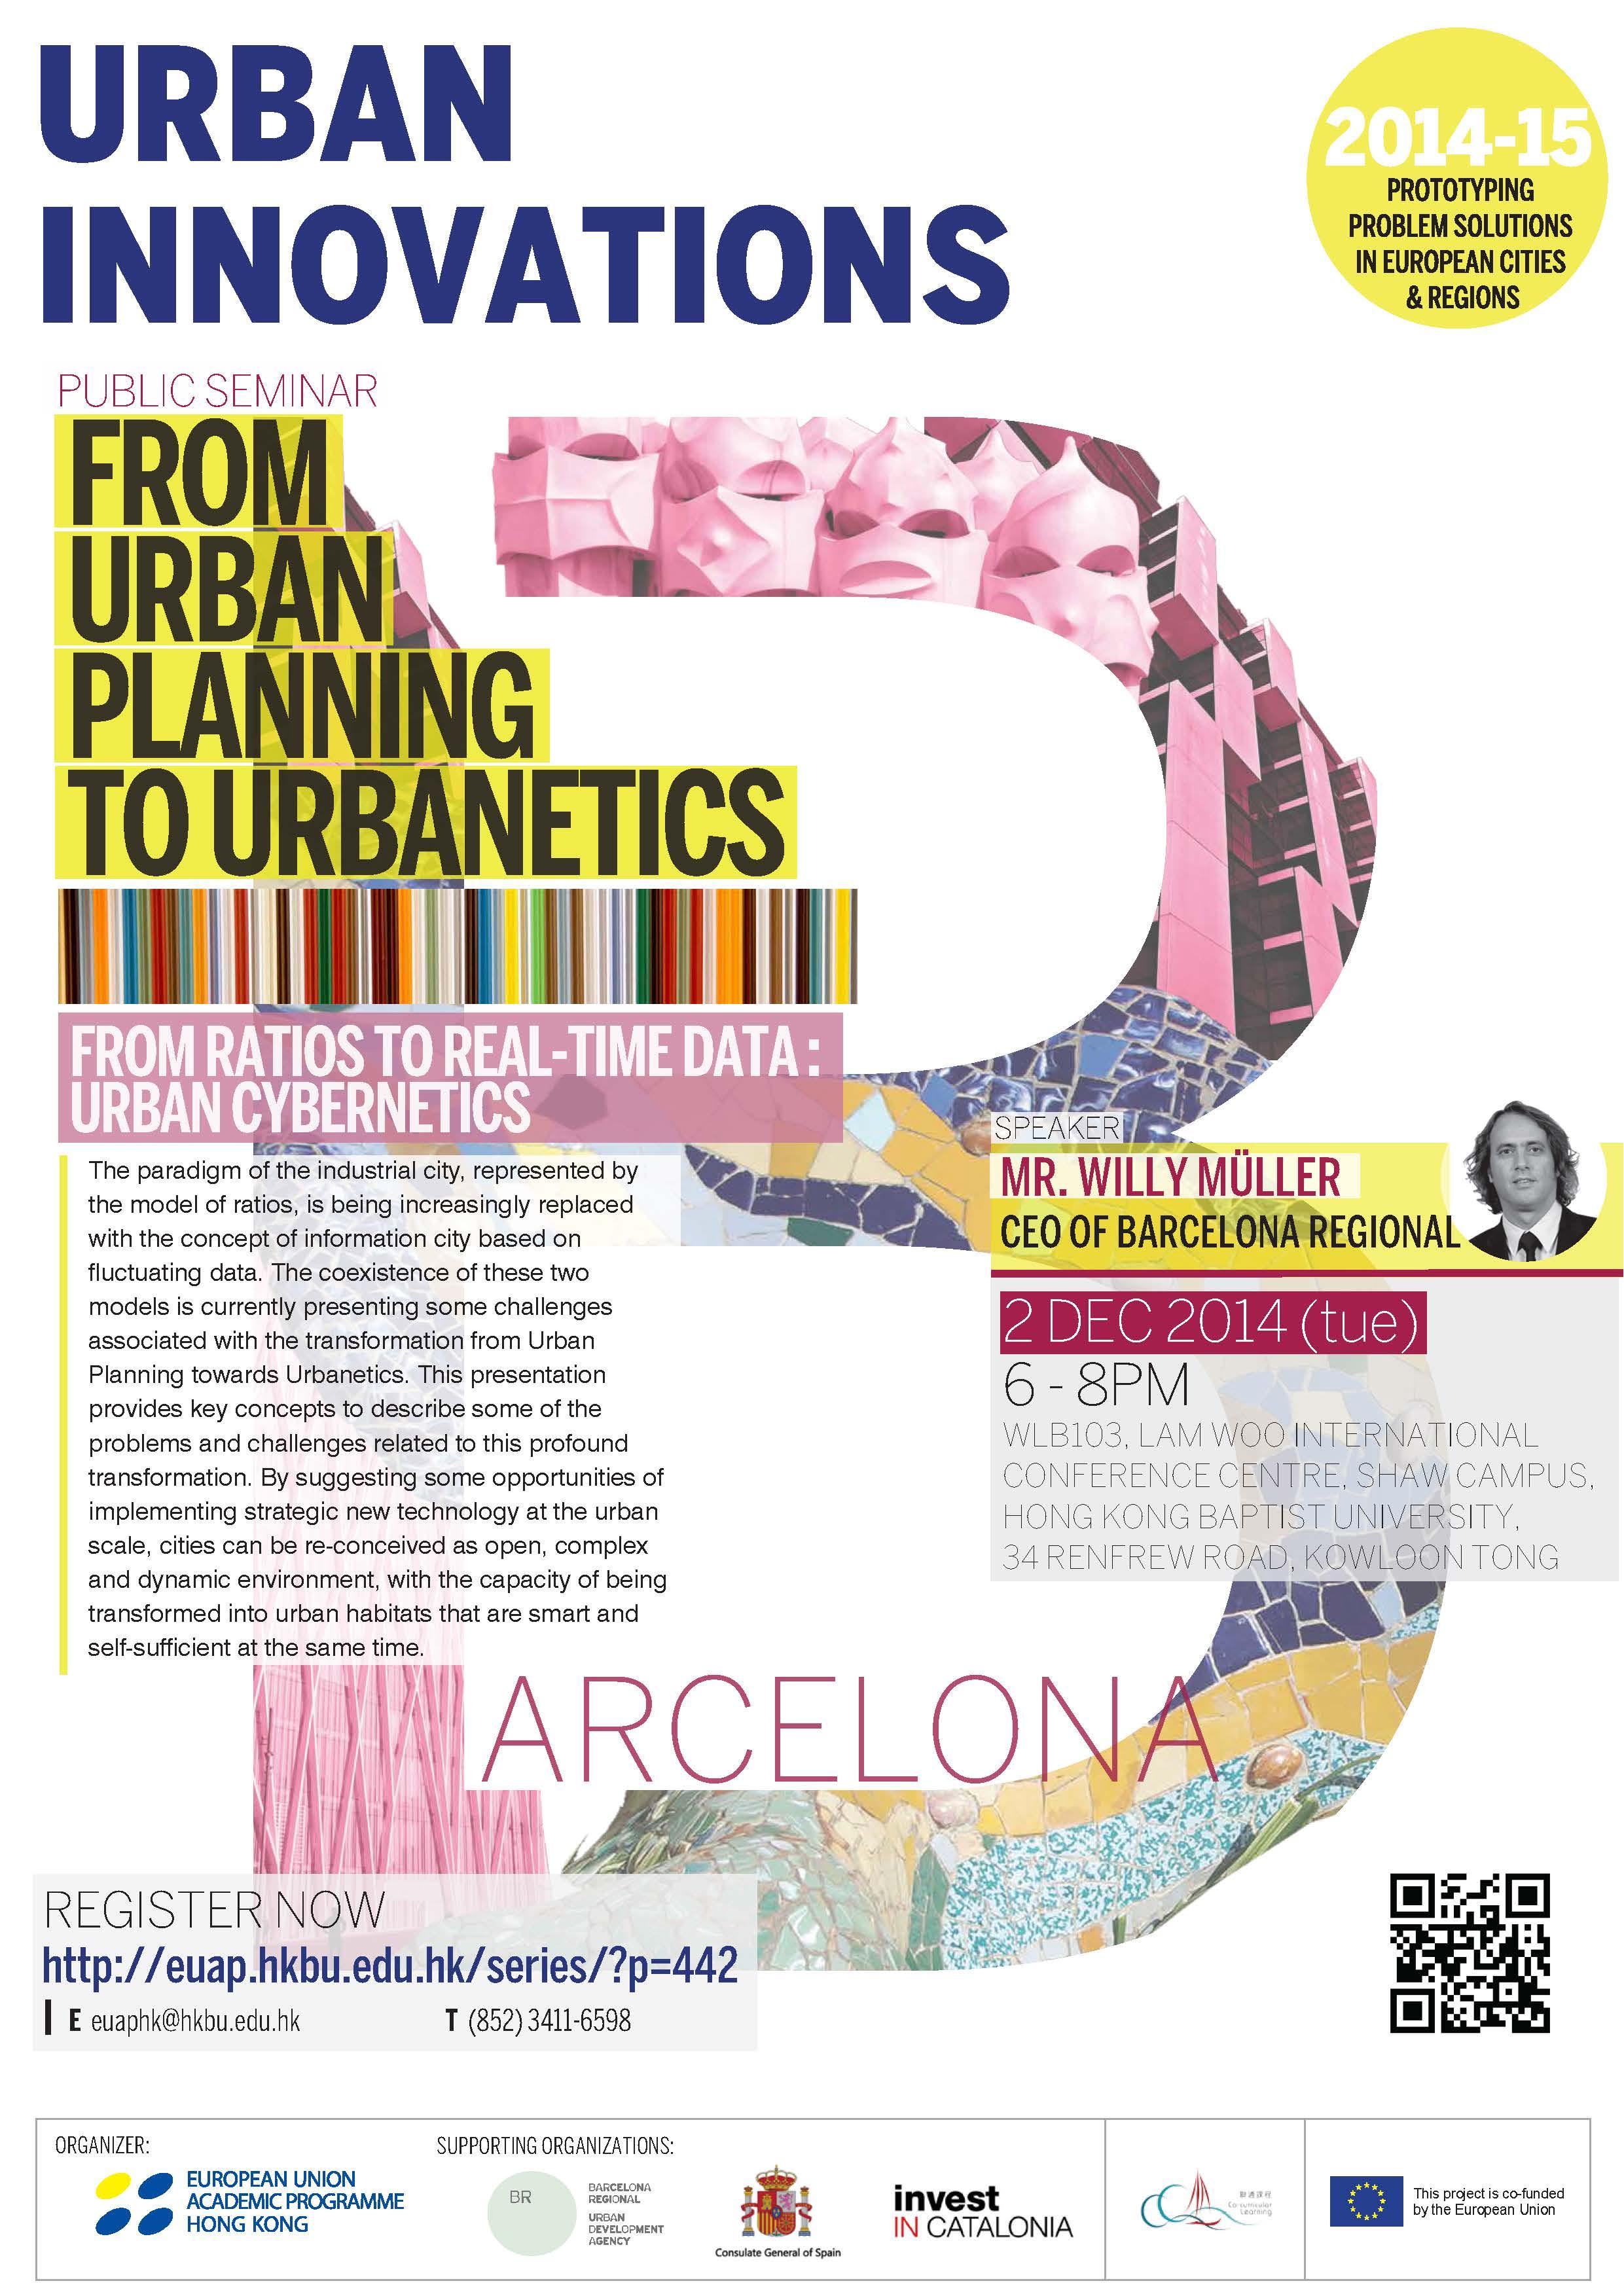 2Dec_From Urban Planning to Urbanetics